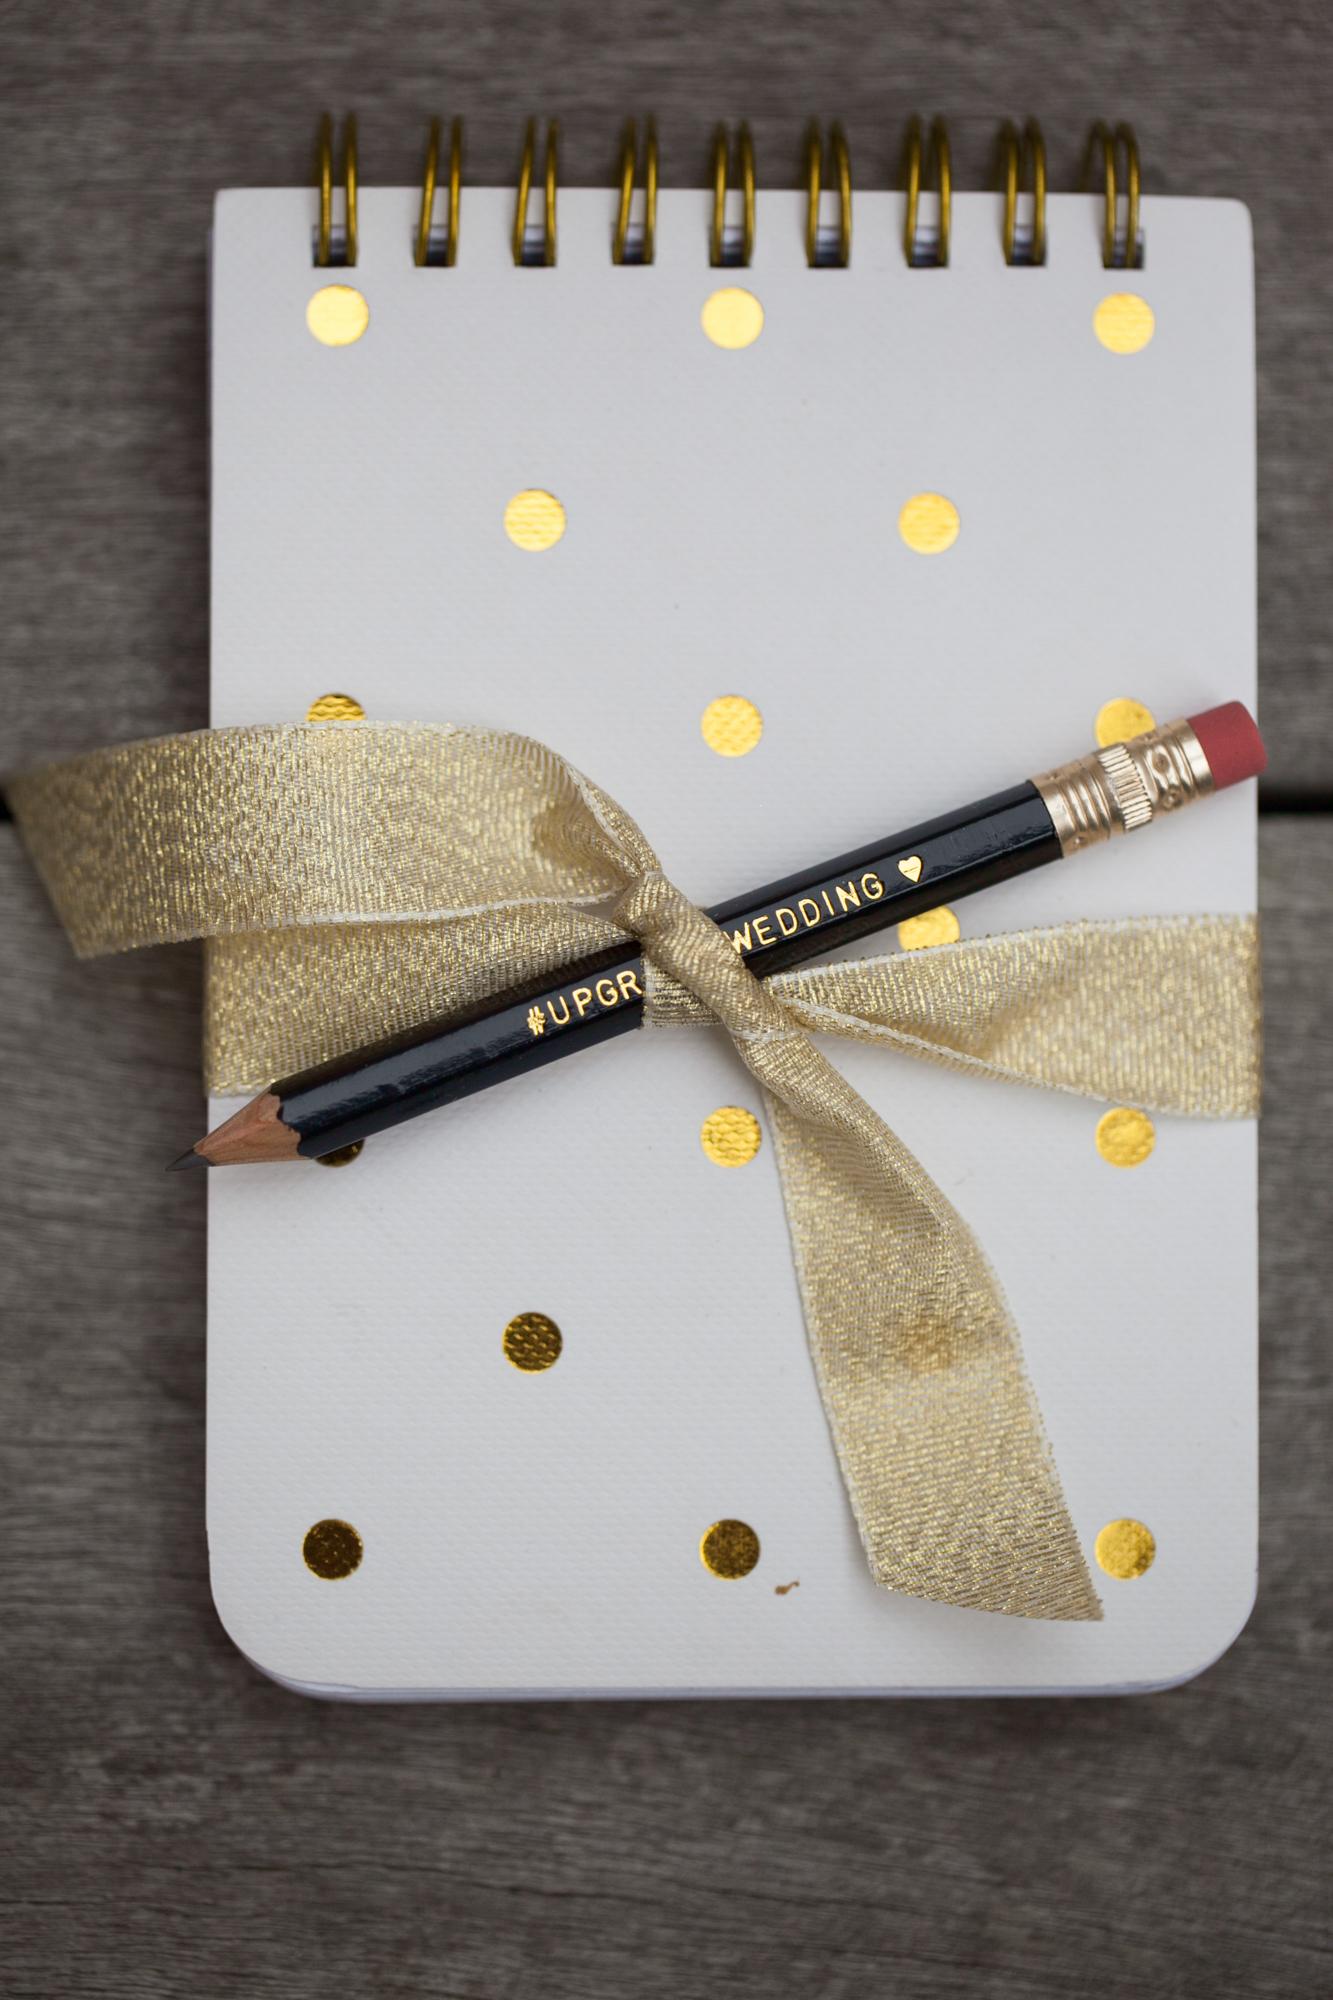 JB_Belle-Mer-Newport-Wedding-Champagne-and-Ink-Blush-Gold-Details-NewportWedding-Inspo-4.jpg